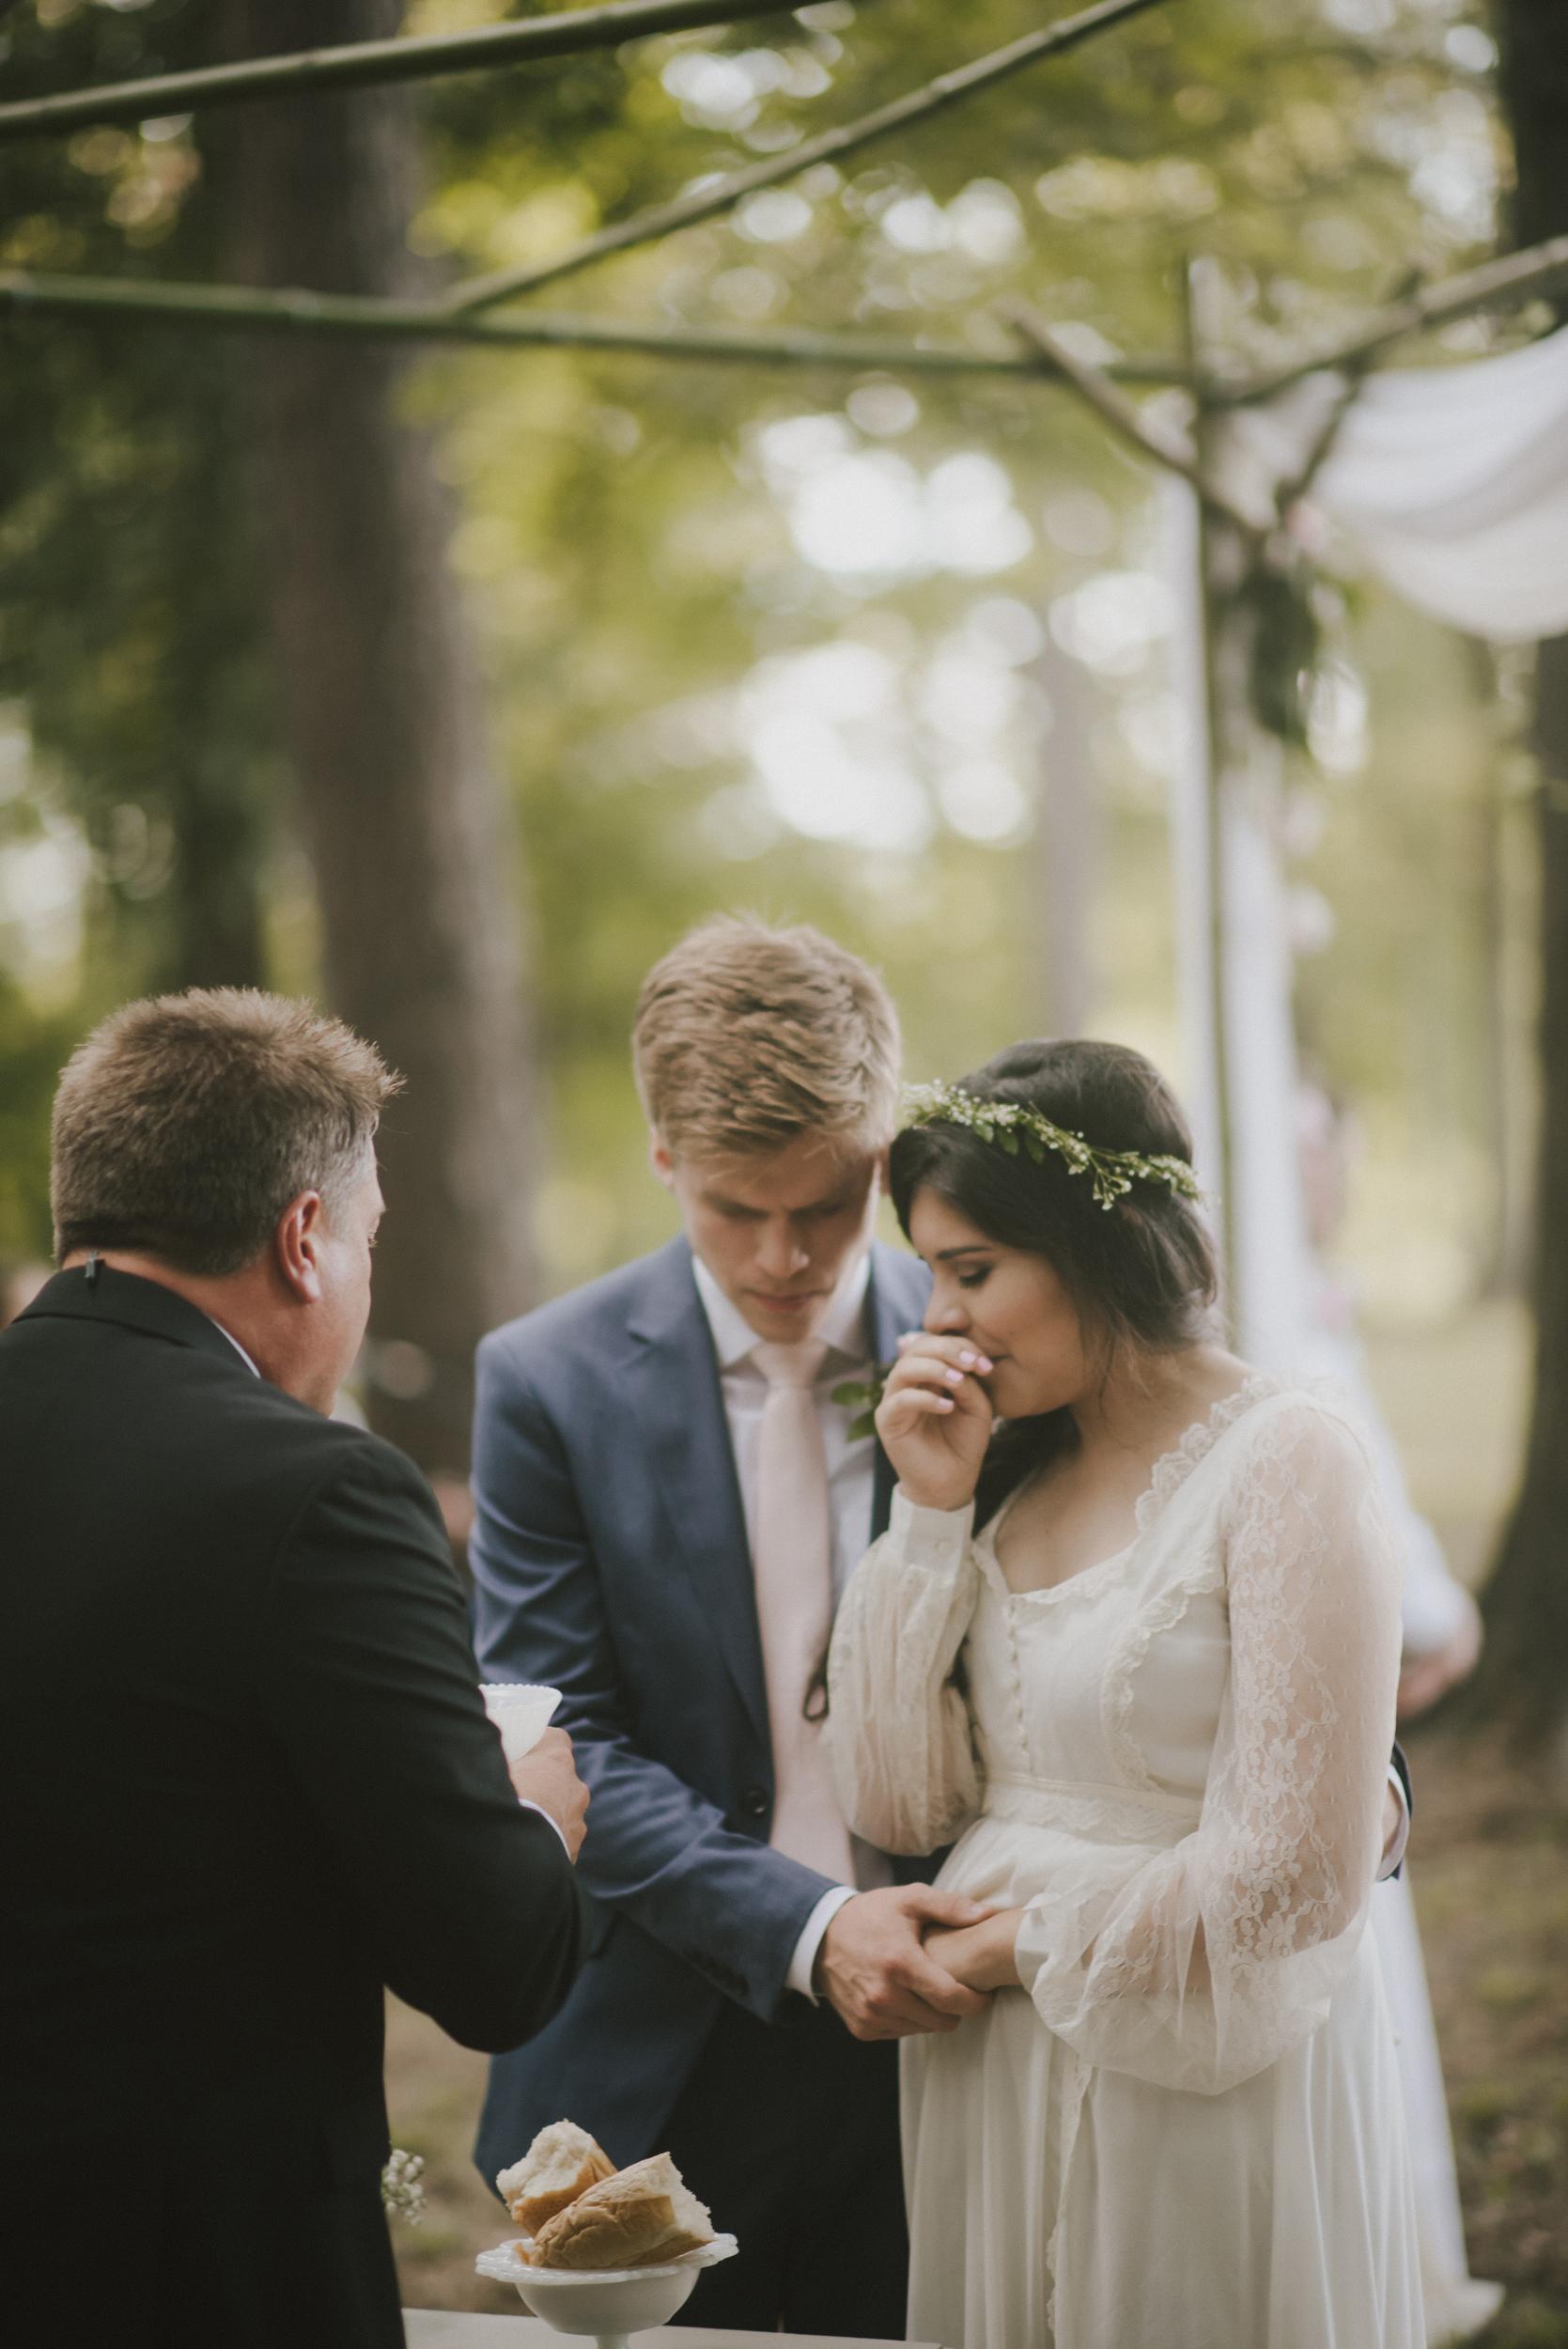 ofRen_weddingphotographer-136.jpg